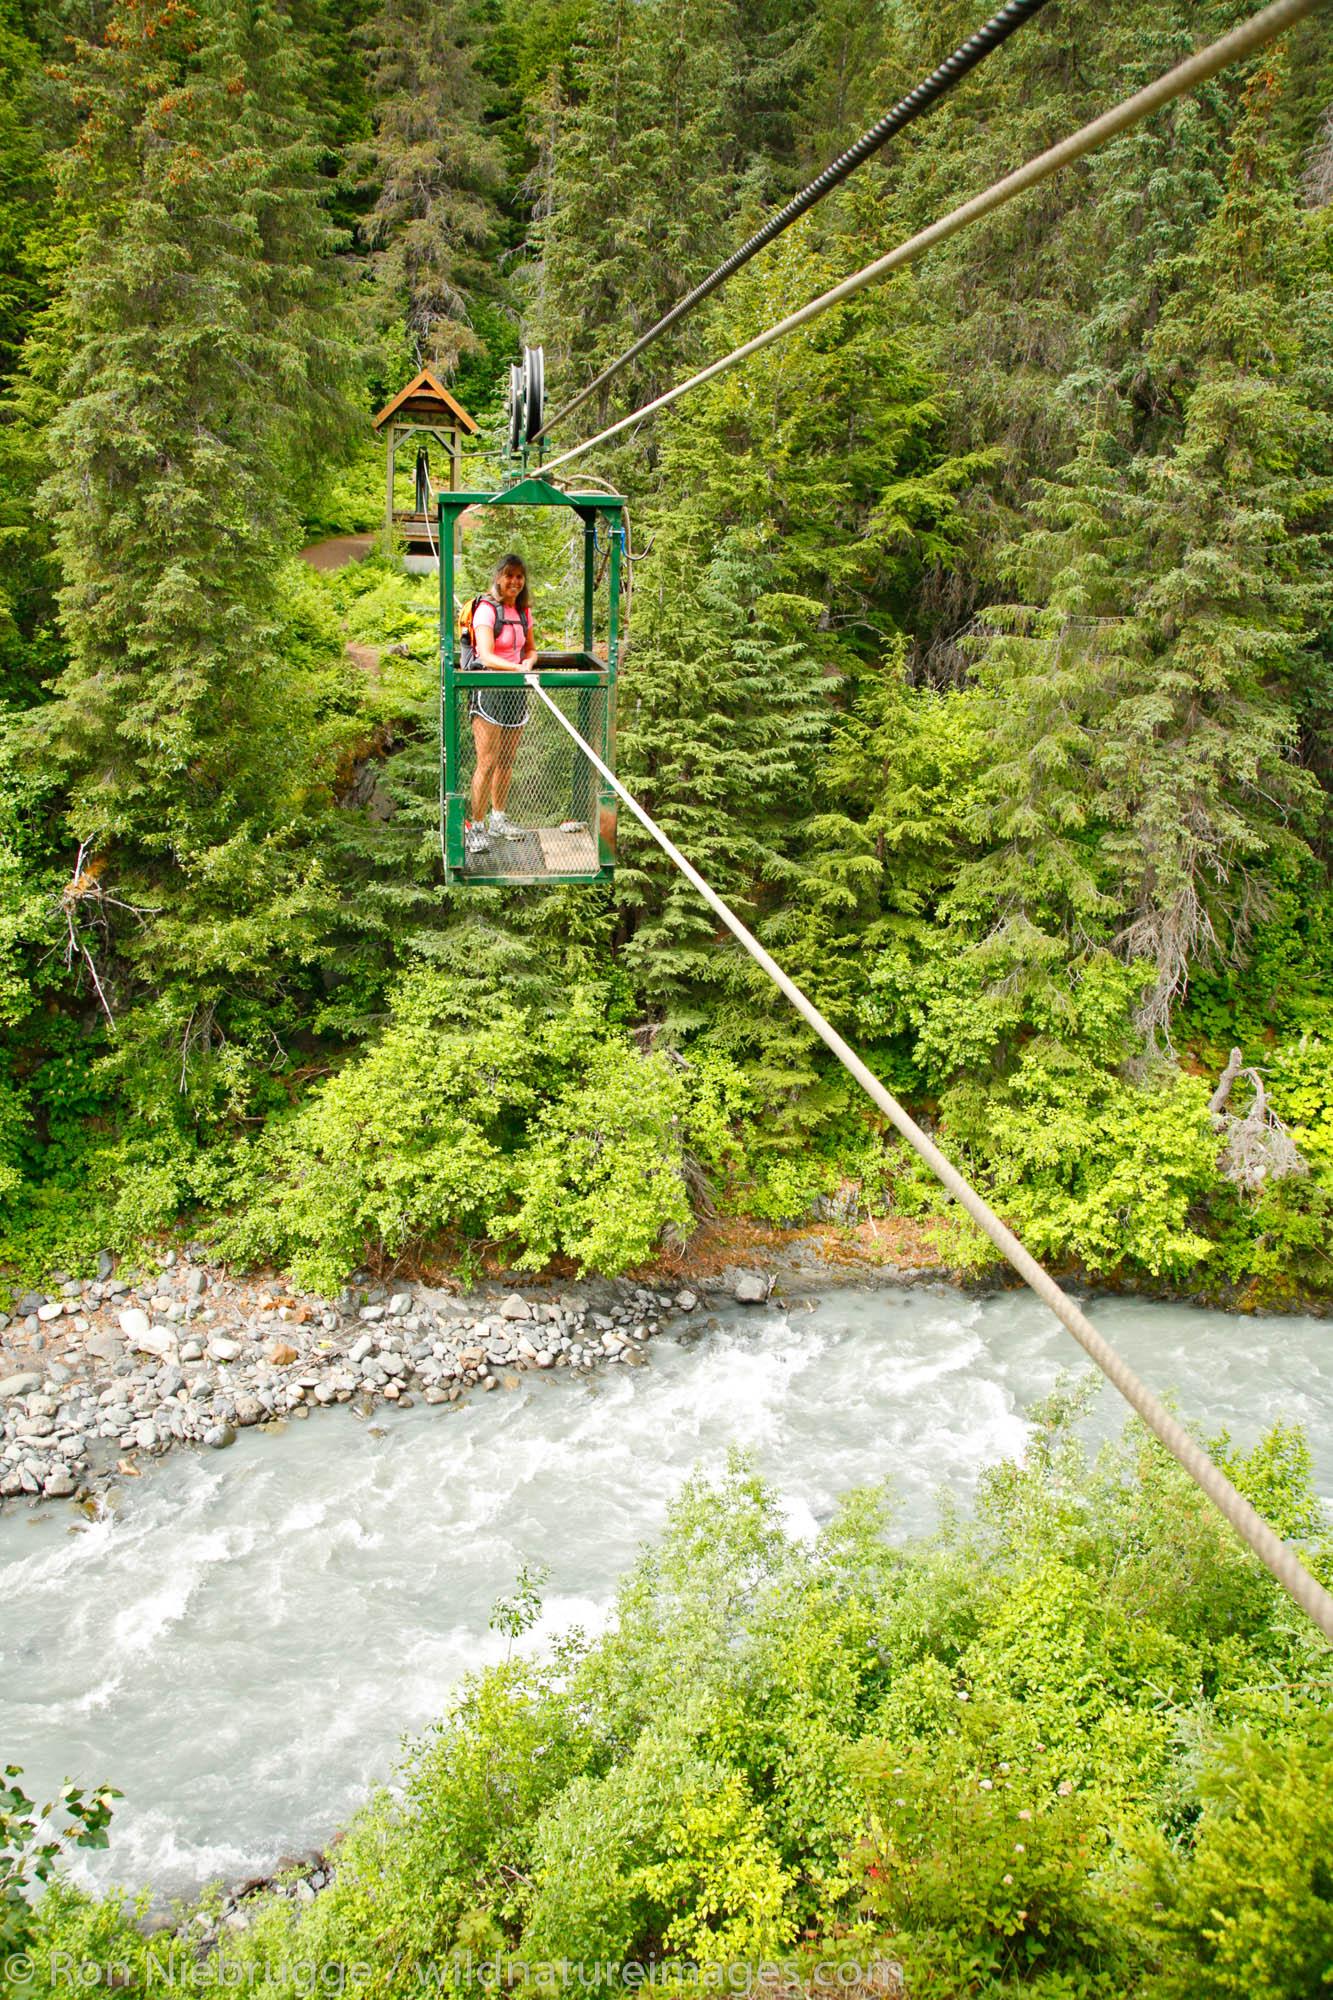 A hiker pulls herself across Glacier Creek on the aerial hand tram, Winner Creek Gorge Trail, Girdwood, Chugach National Forest...